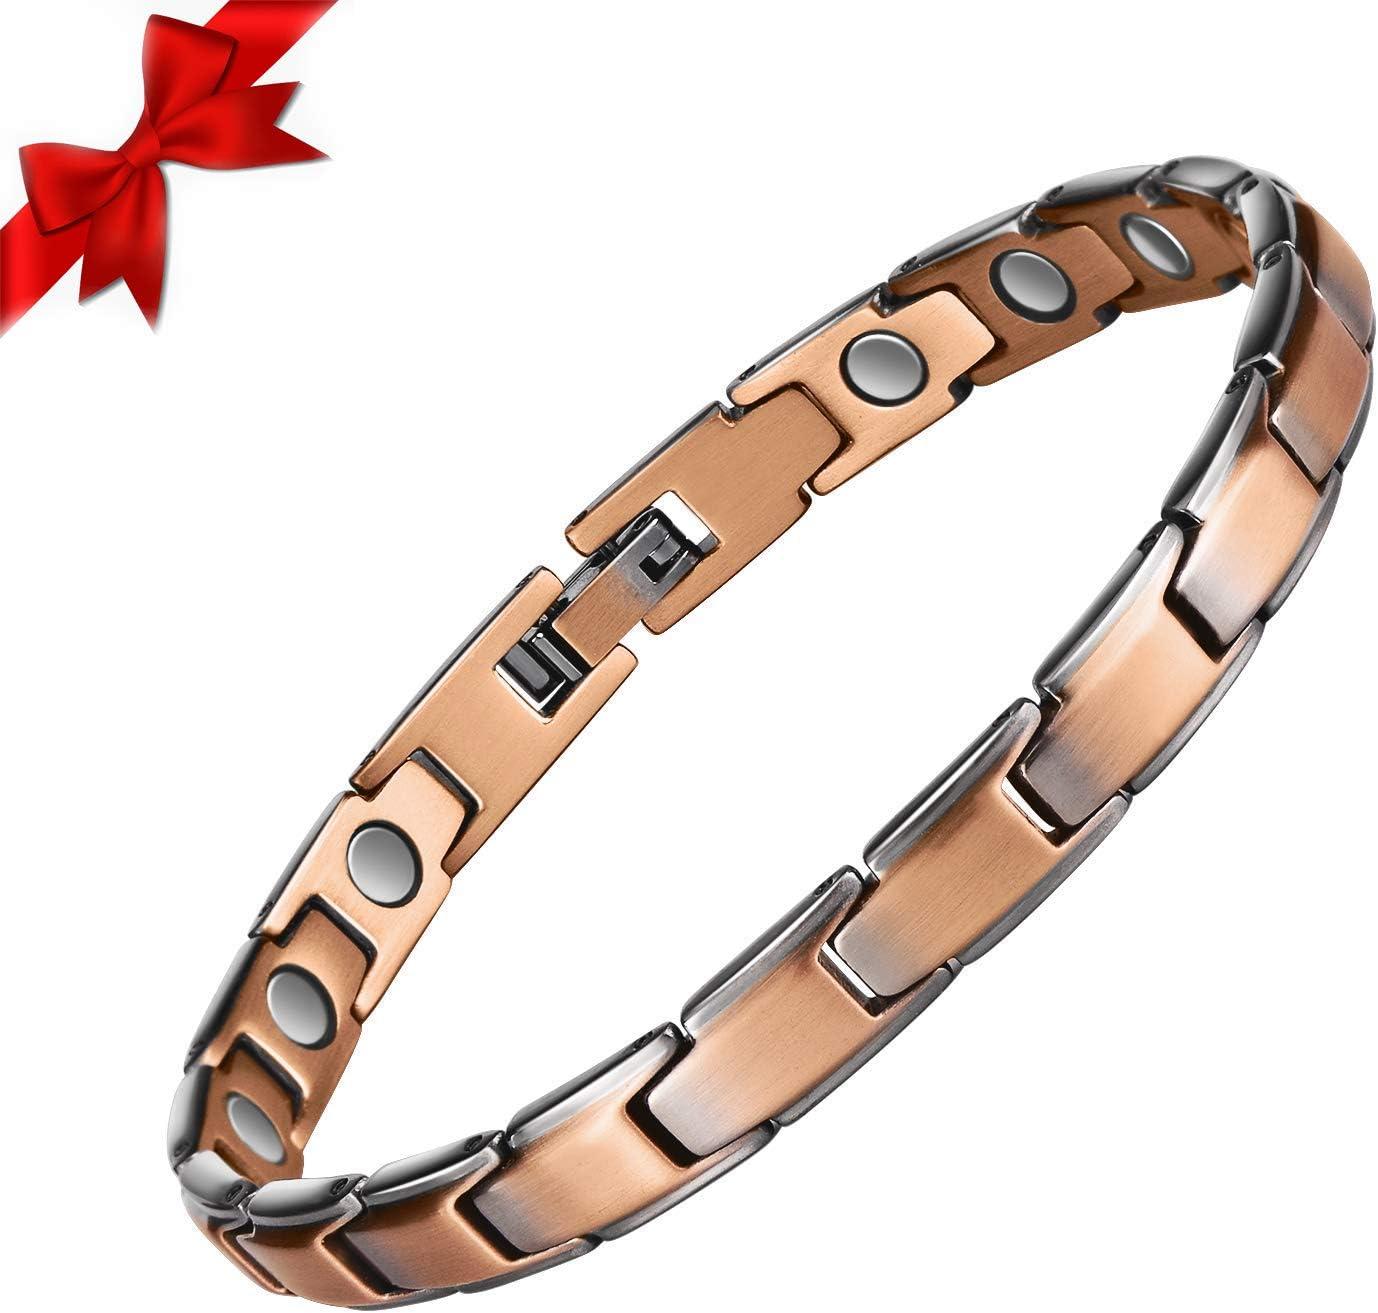 Retro red and bronze bracelet